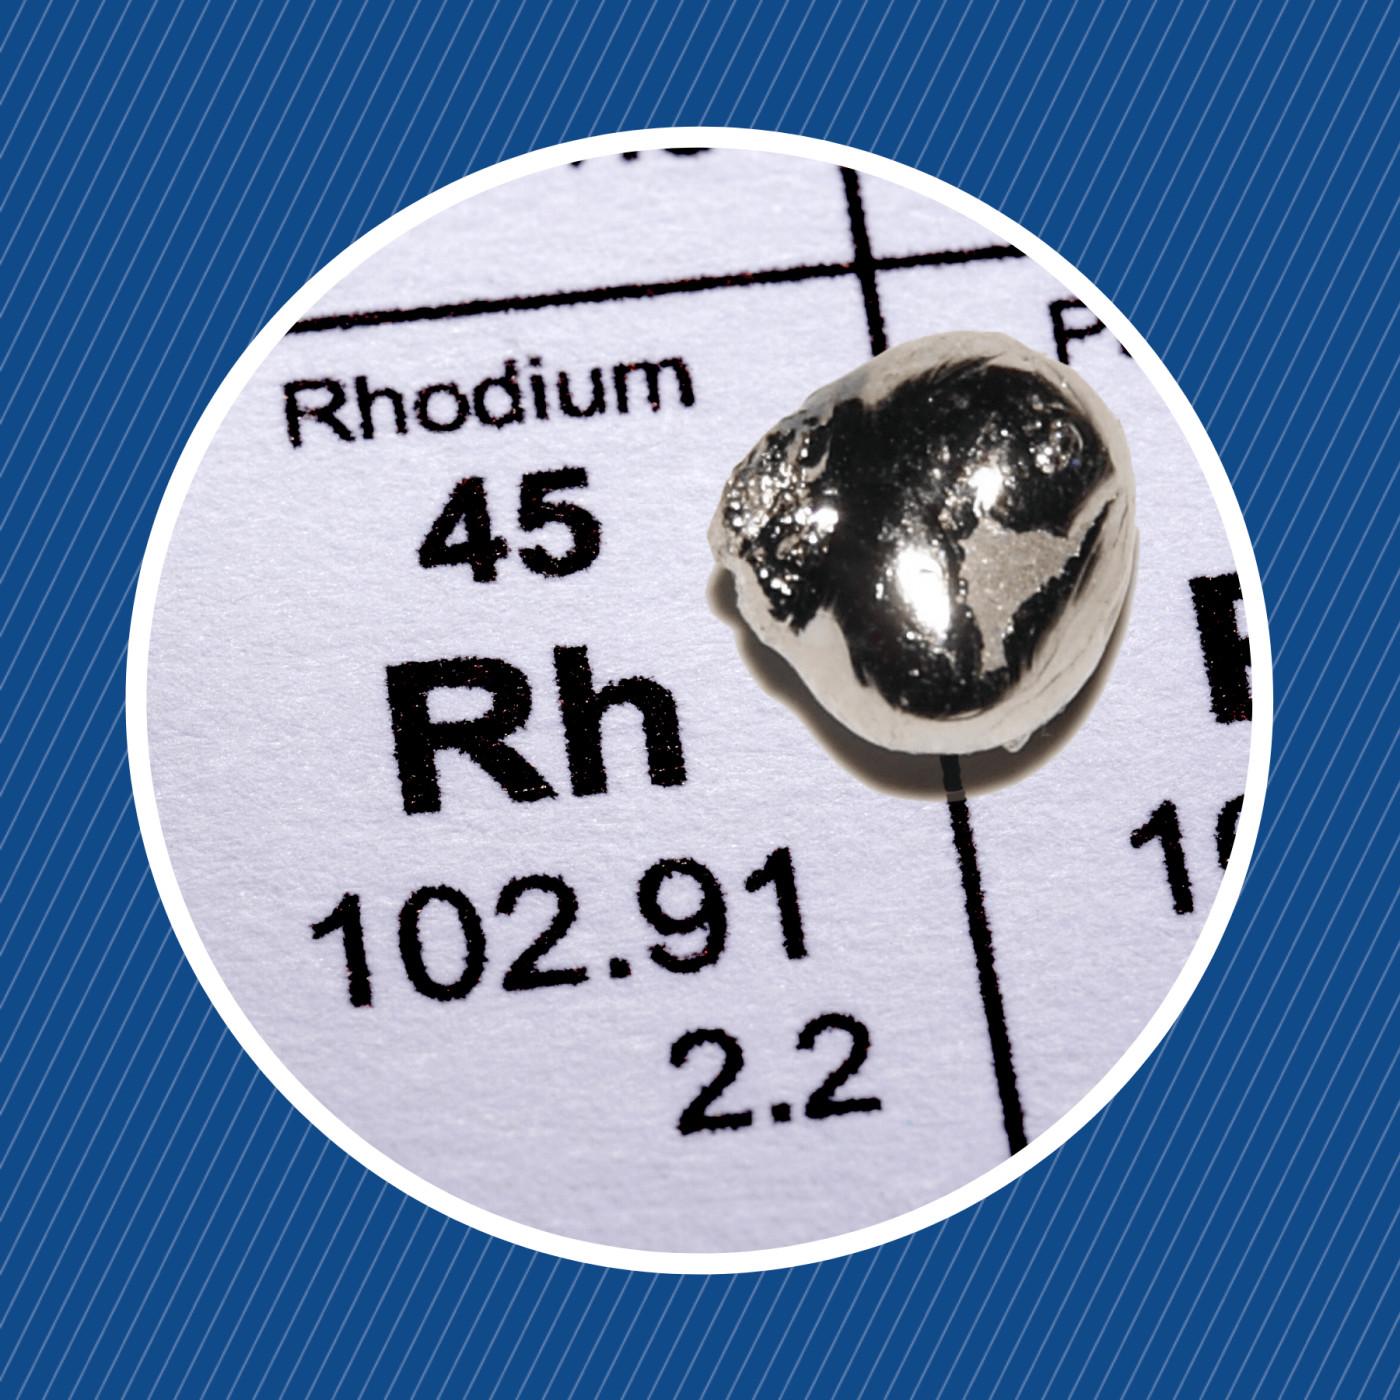 Qu'est-ce que le rhodium ?